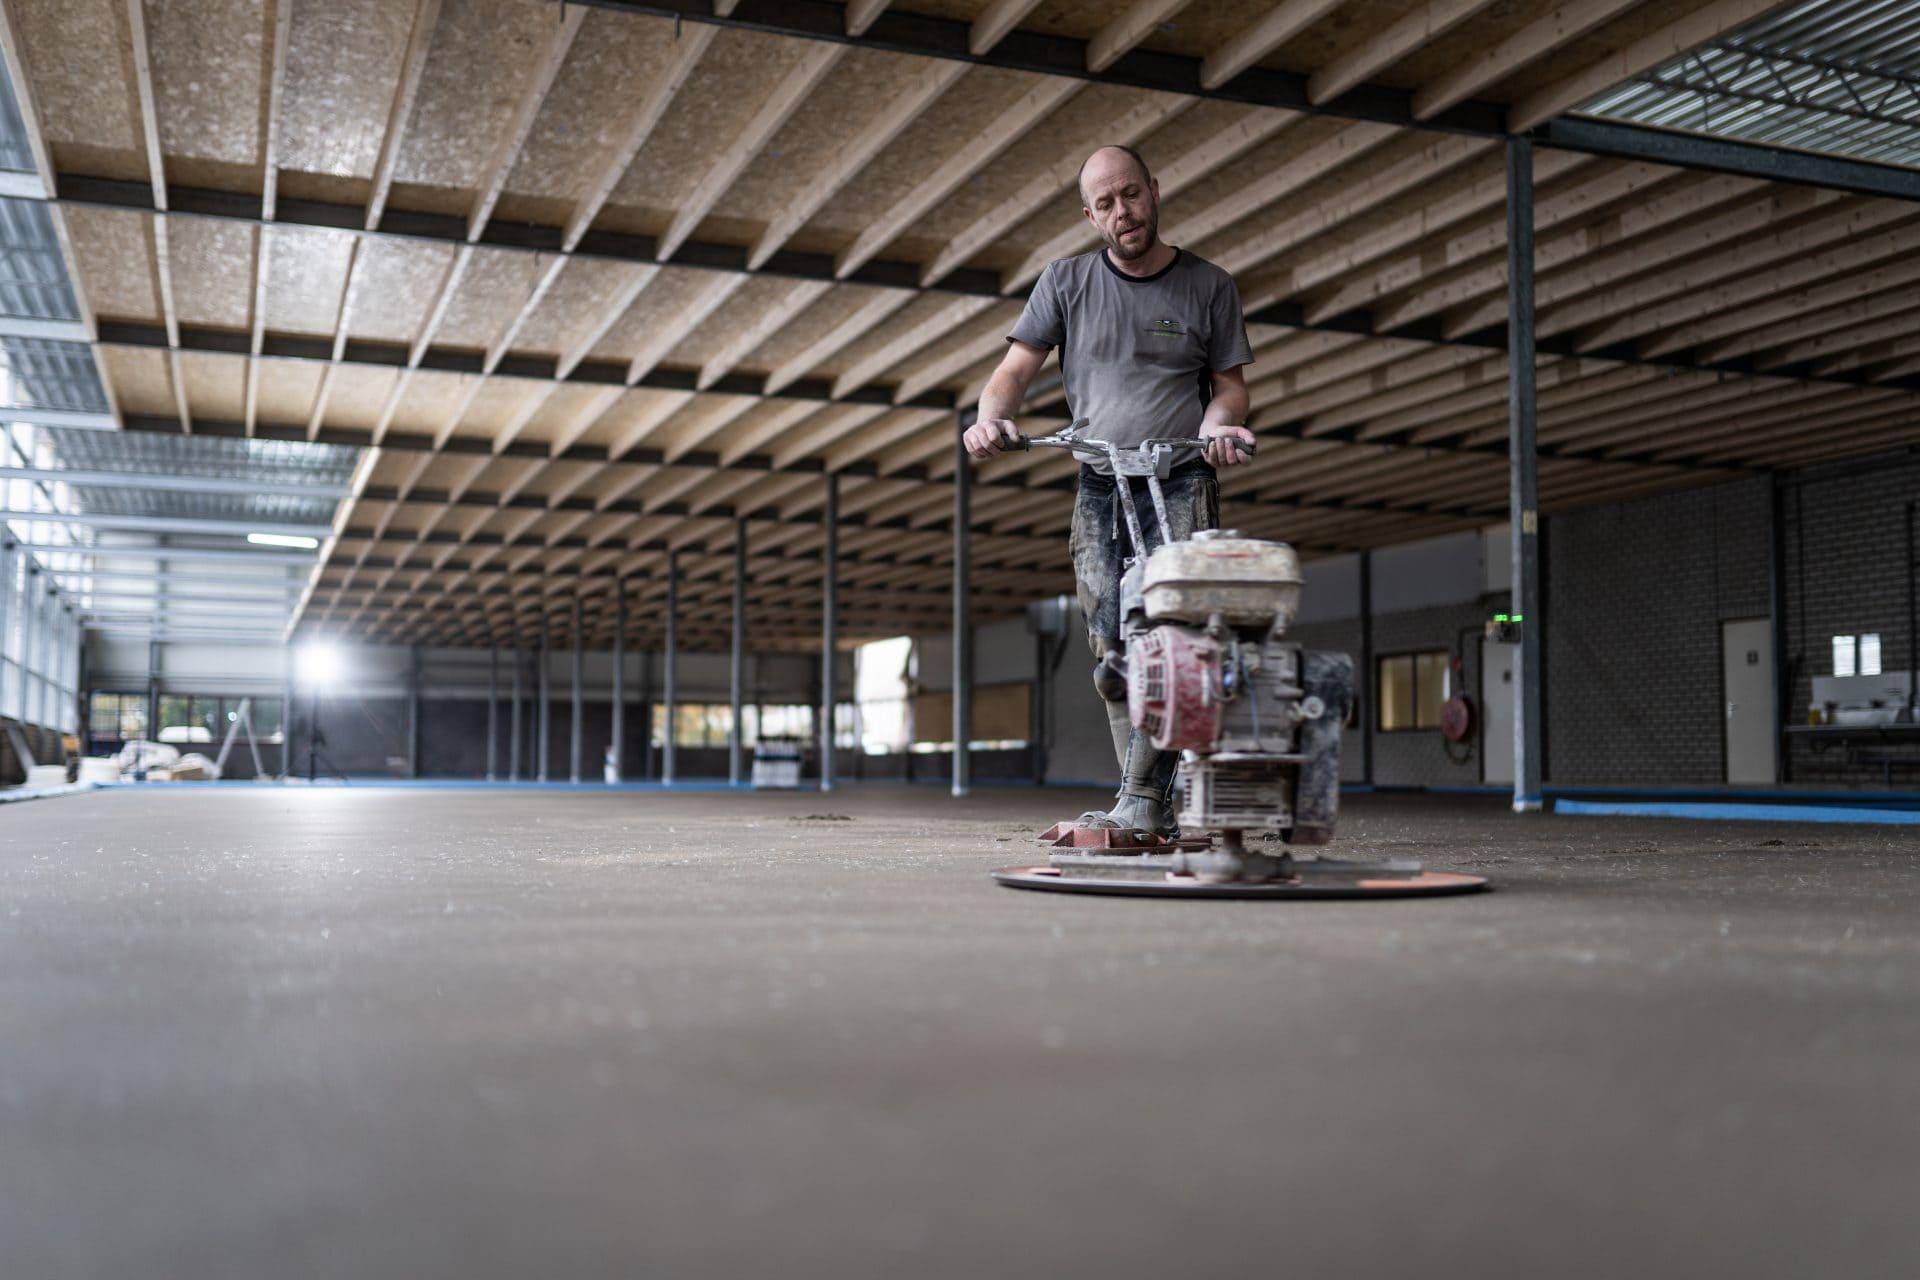 Cementdekvloer maken